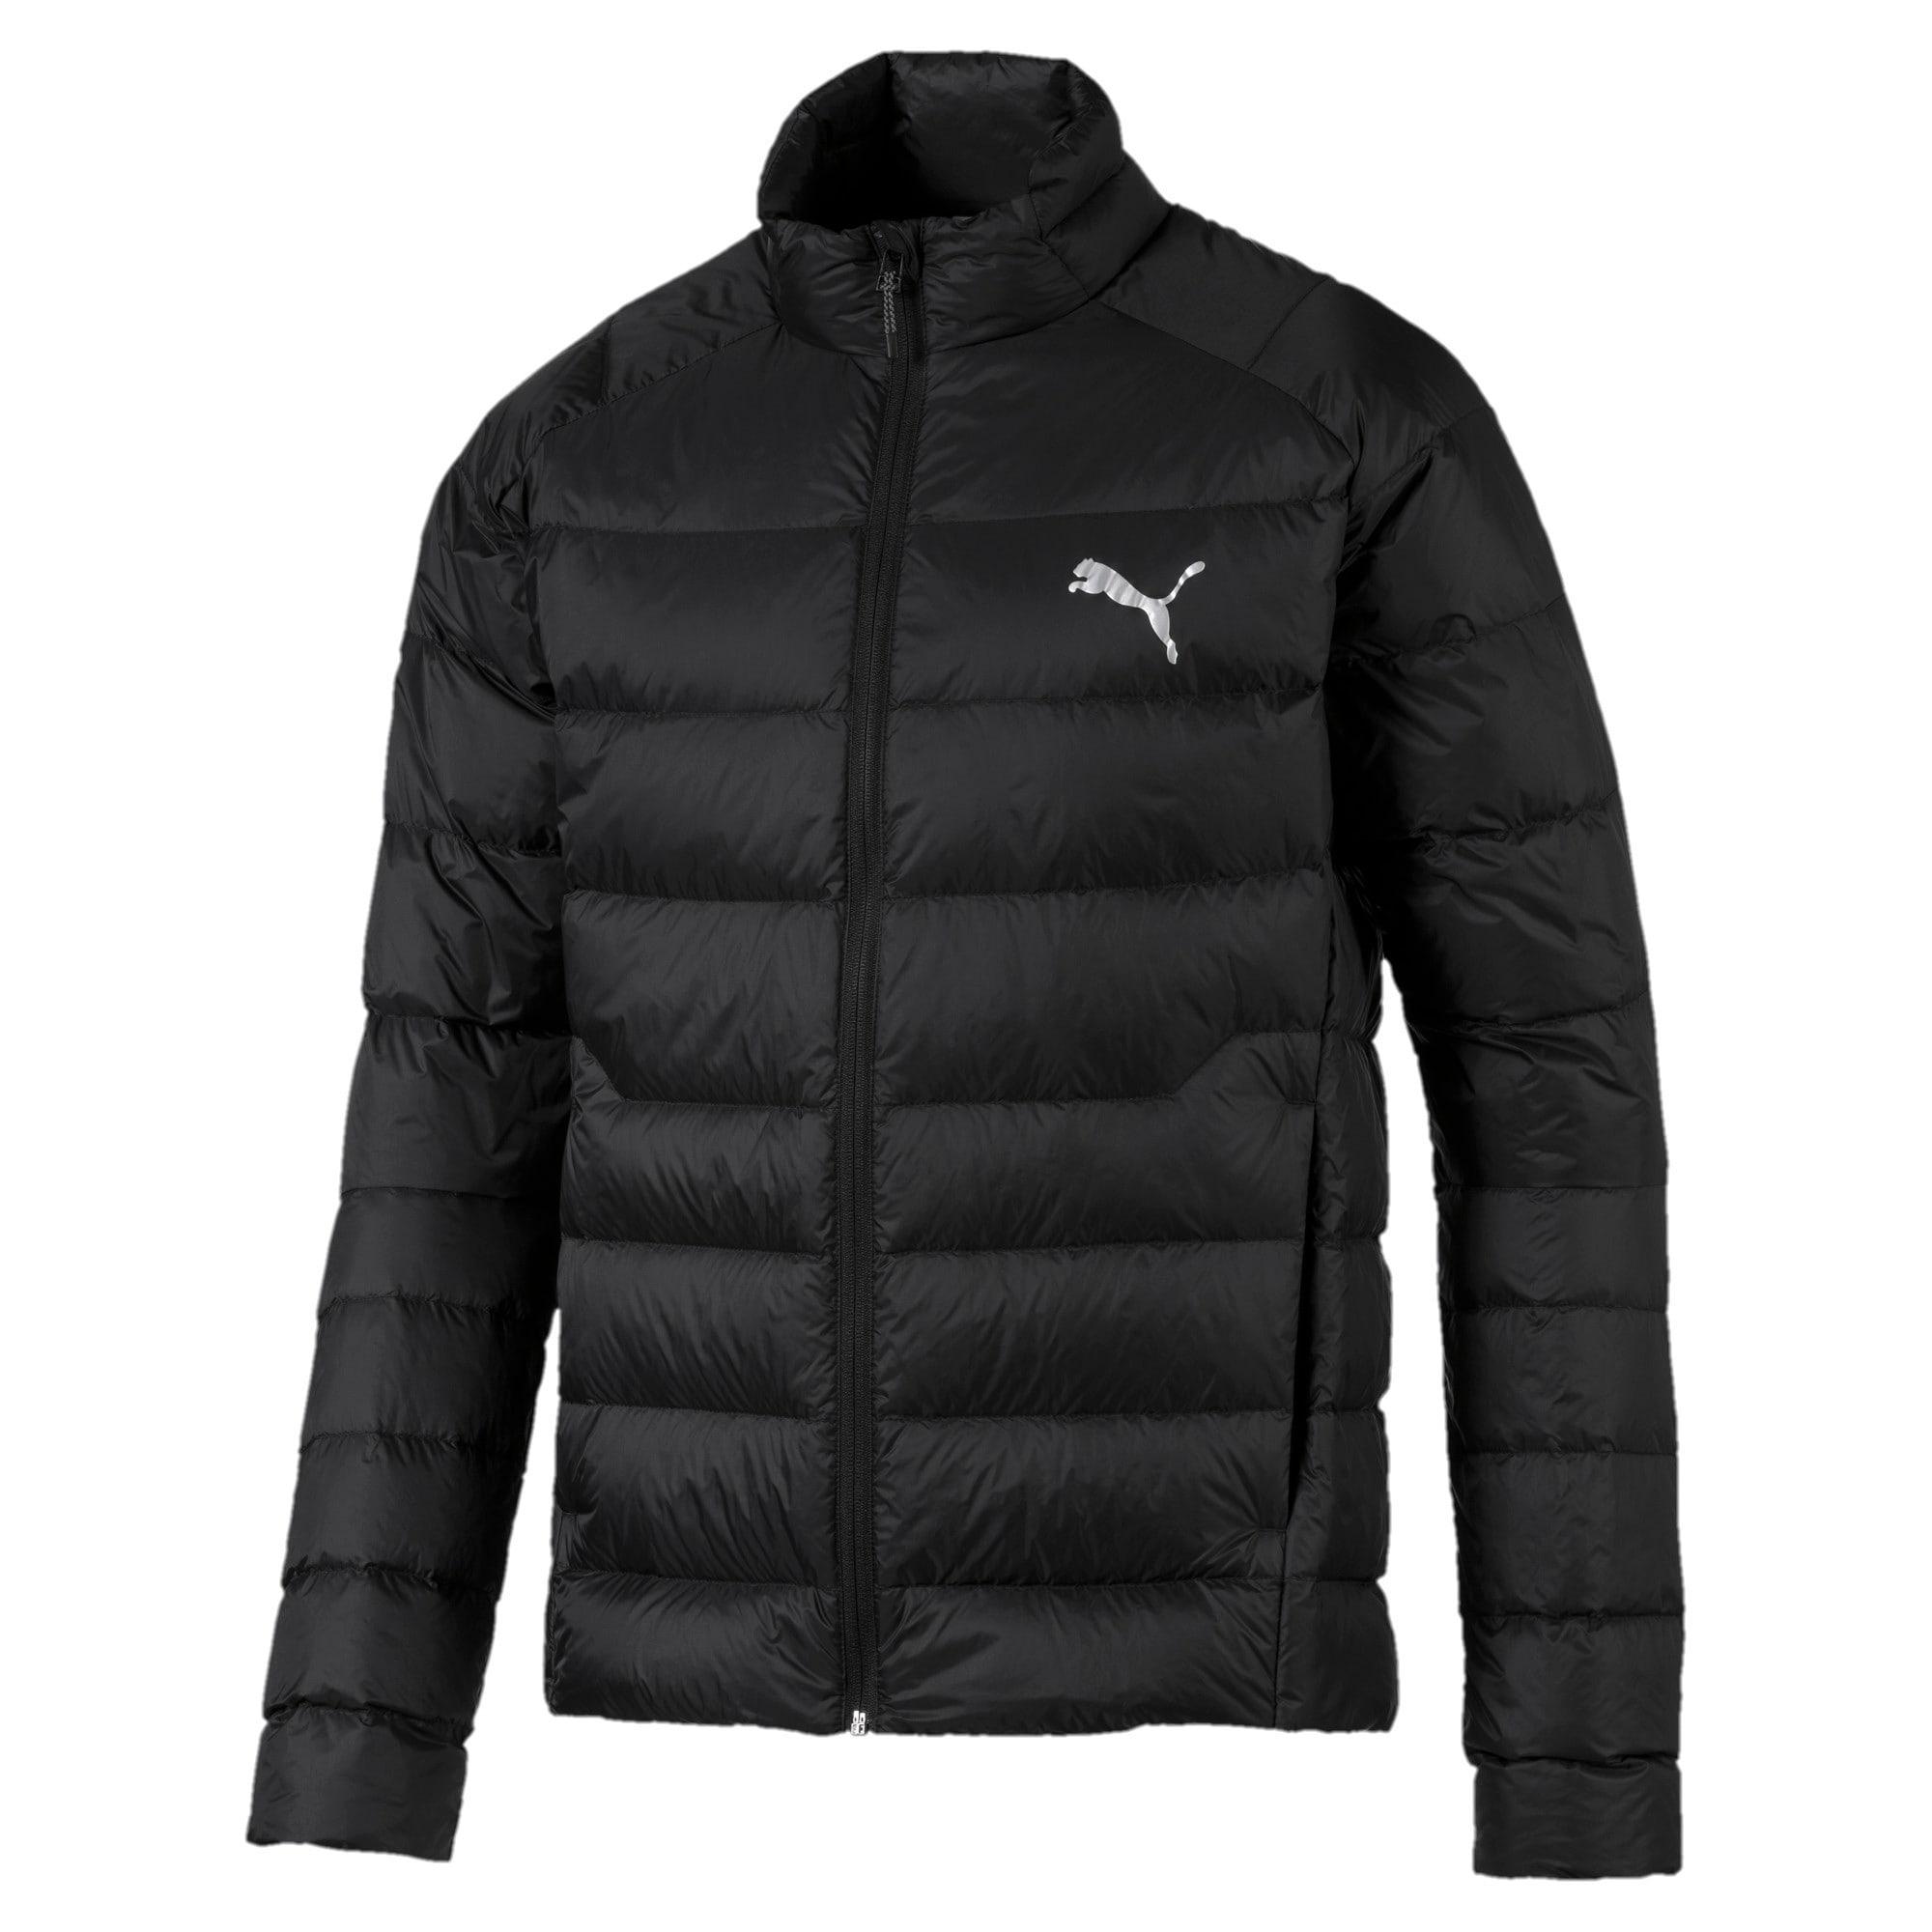 Thumbnail 4 of PWRWarm packLITE 600 Down Men's Jacket, Puma Black, medium